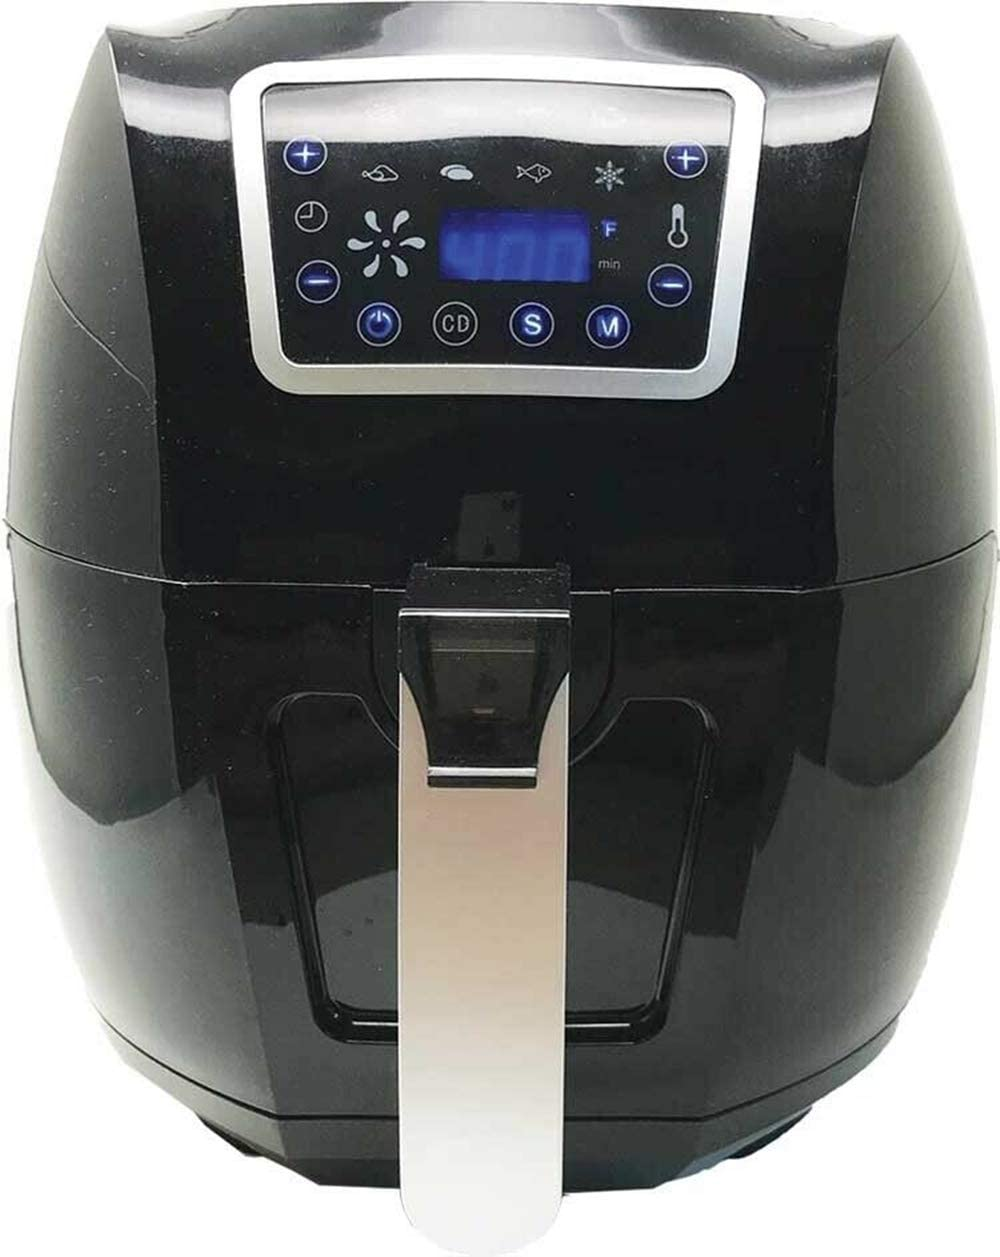 Air fryer electric 6 qt 1700w digital timer temp control 8 presets oil less